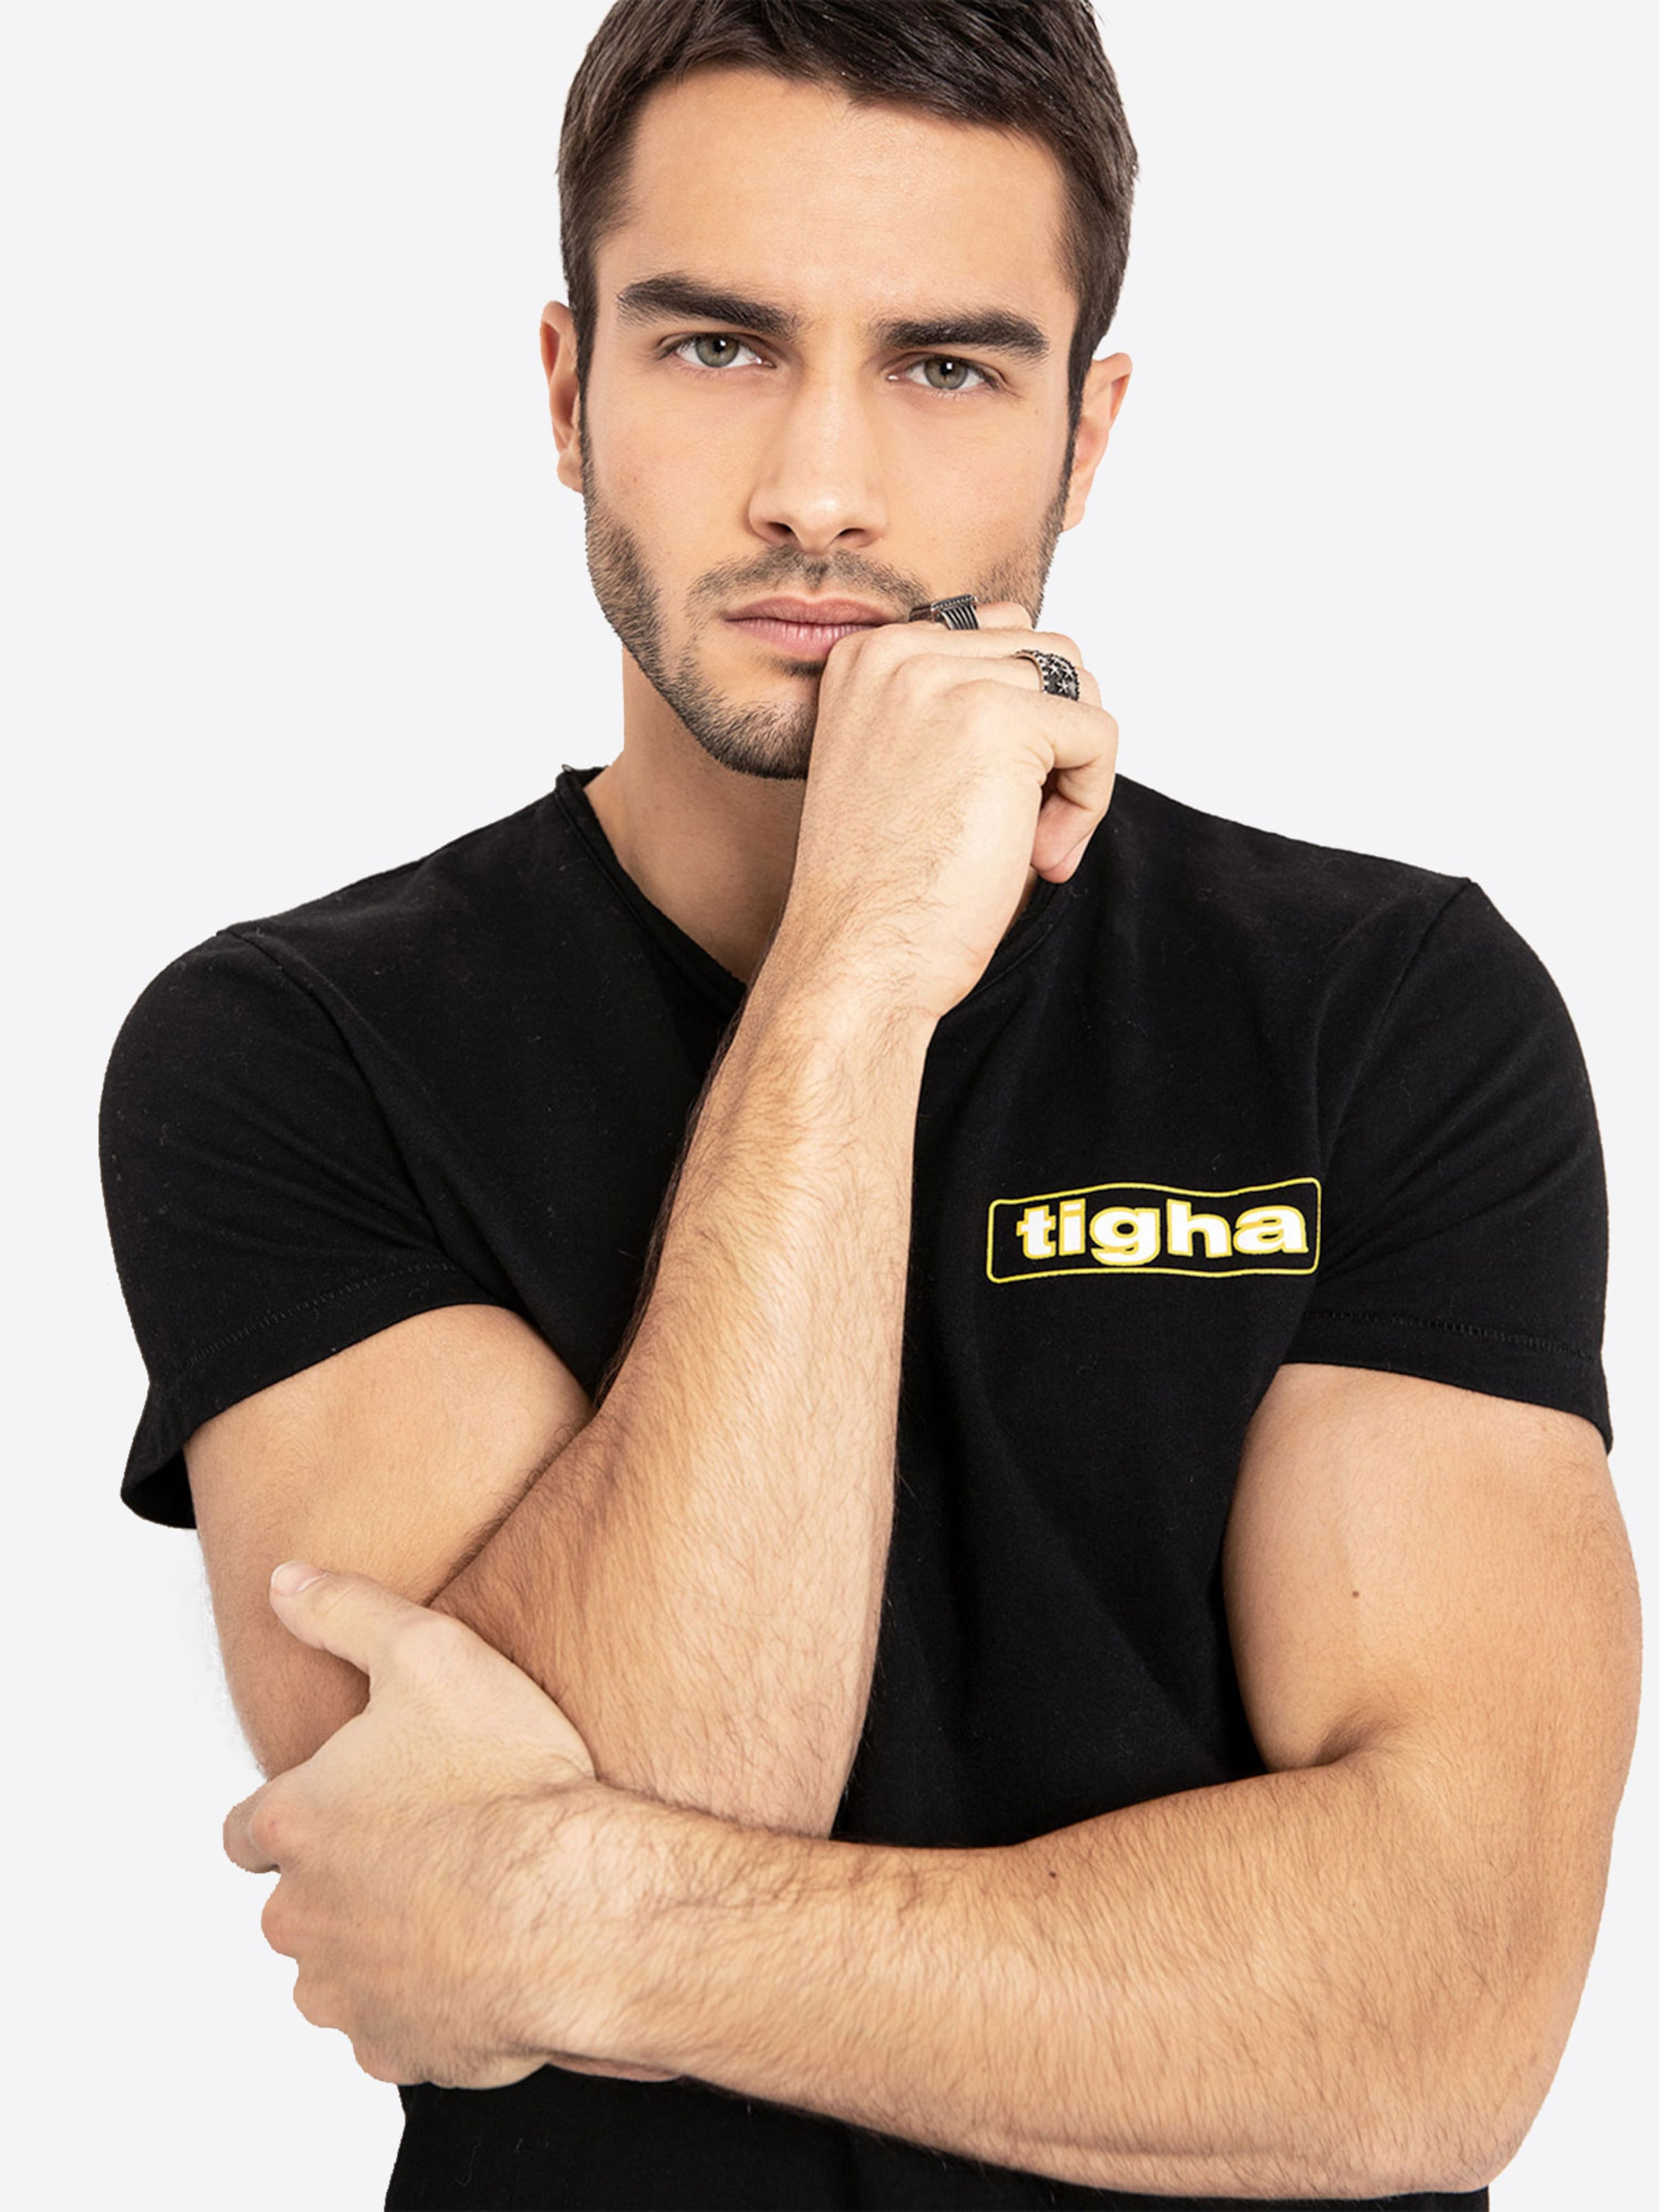 Shirt GelbSchwarz 'meo' Tigha Shirt Shirt GelbSchwarz 'meo' Tigha 'meo' In Tigha In In uikTOPXZ